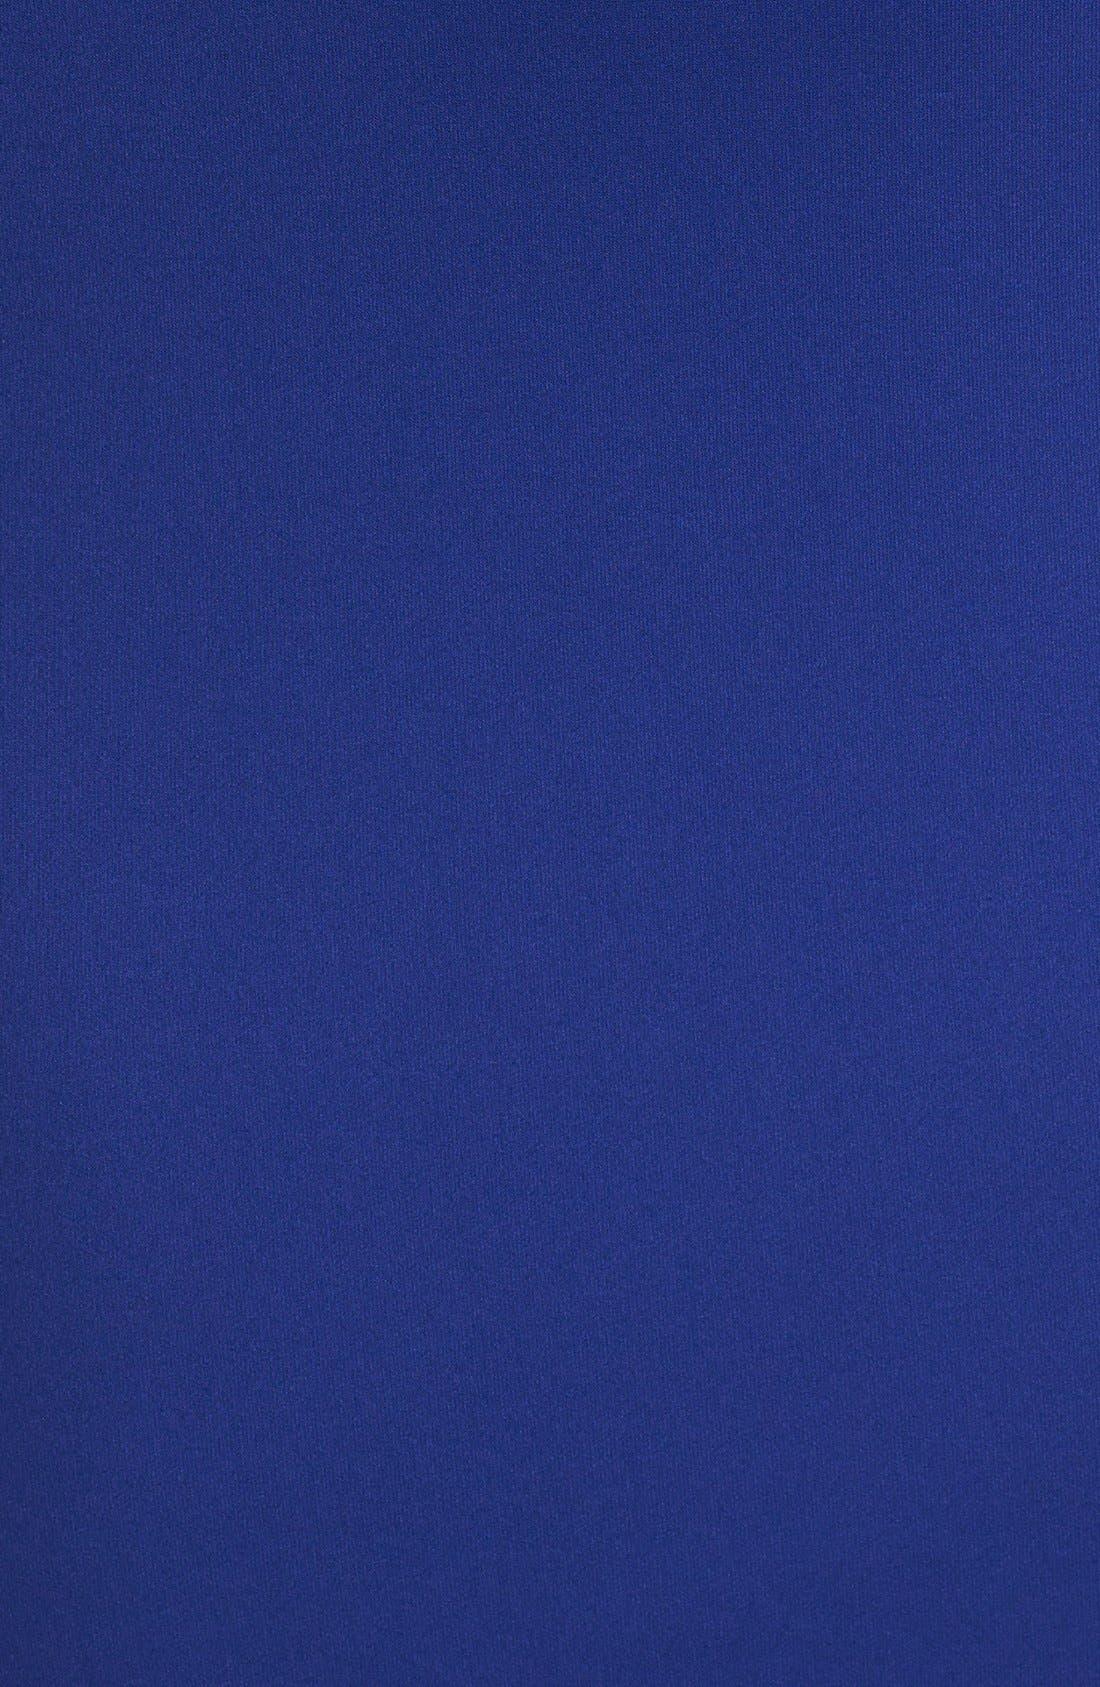 Alternate Image 3  - Alexia Admor Studded Pont Knit Sheath Dress